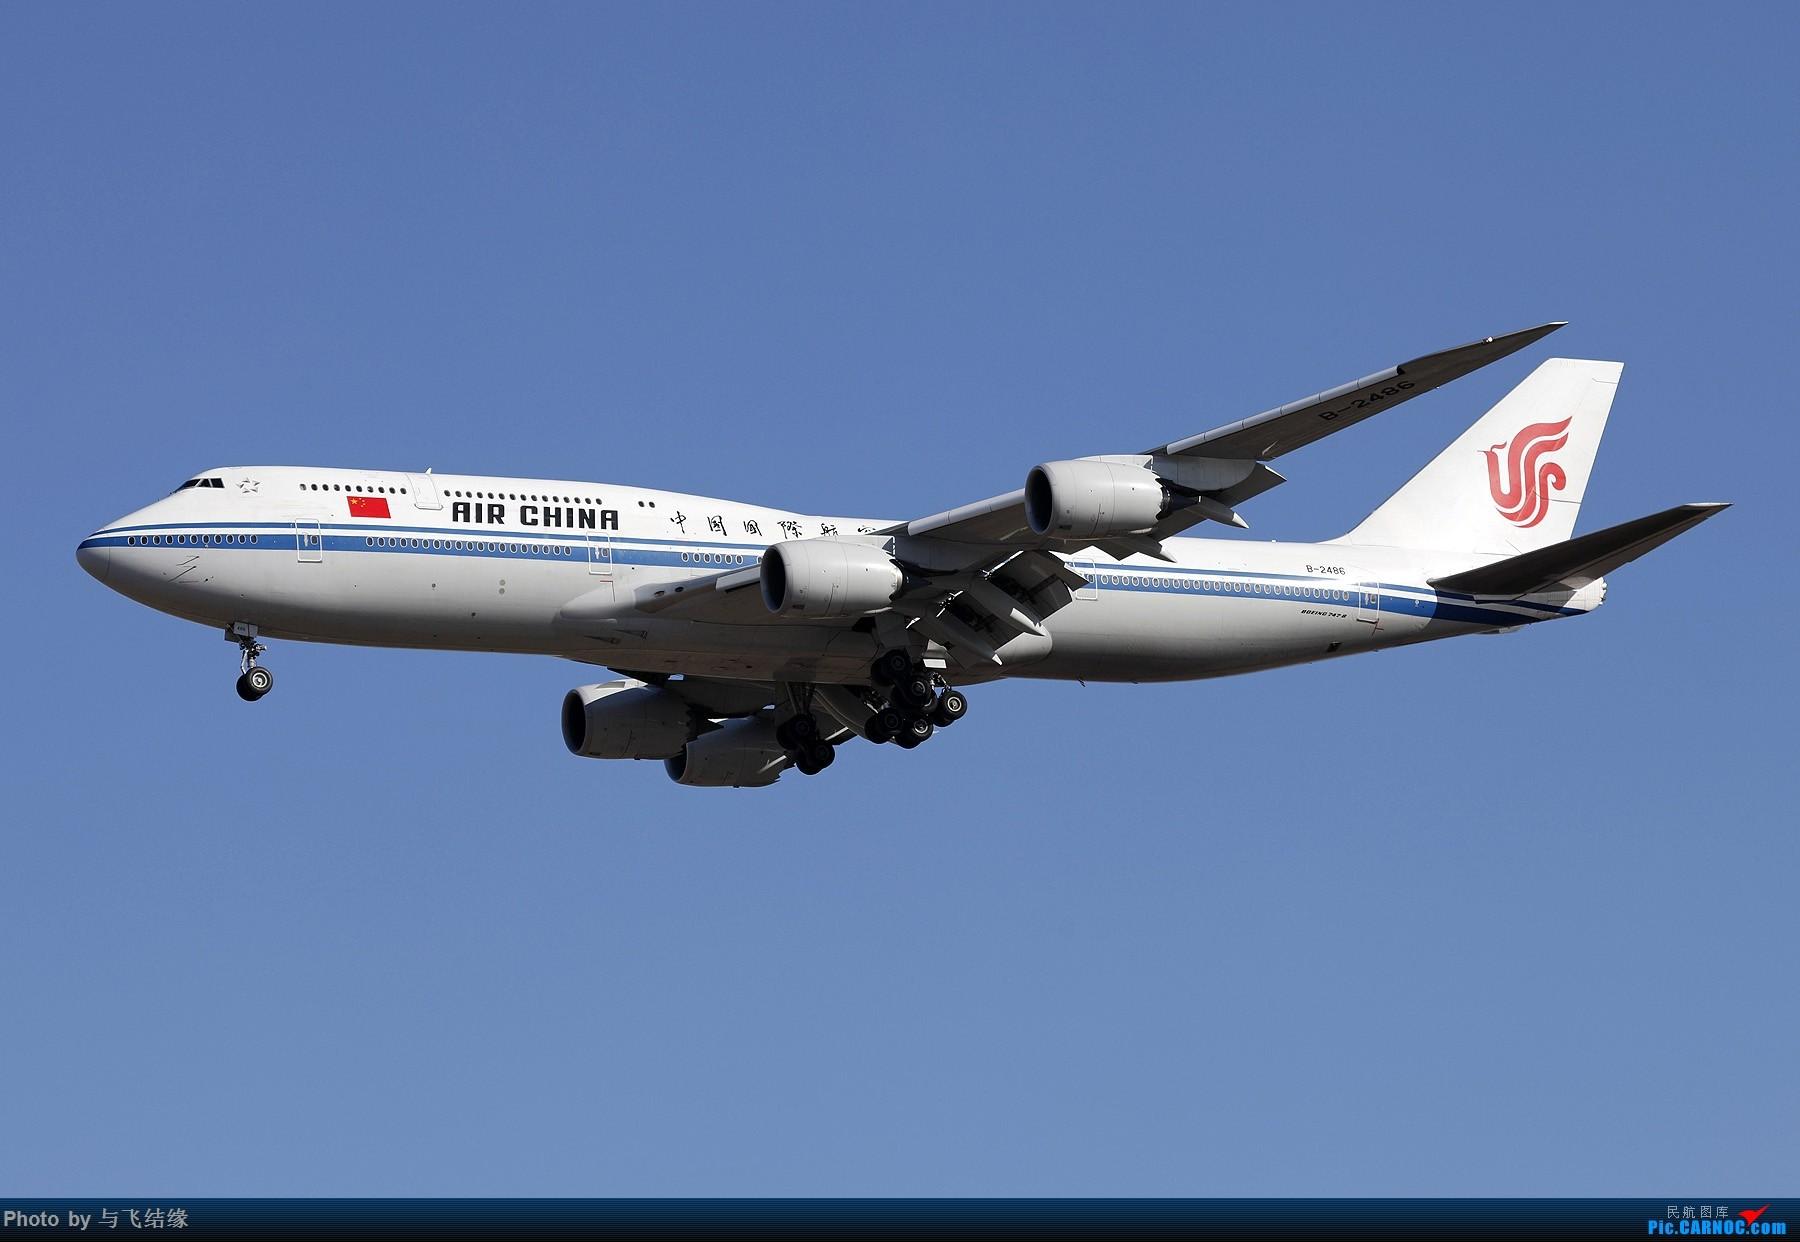 Re:[原创]以色列航空波音777-200、加拿大航空波音77W新装、国航最新空客350-900. BOEING 747-8I B-2486 中国北京首都国际机场